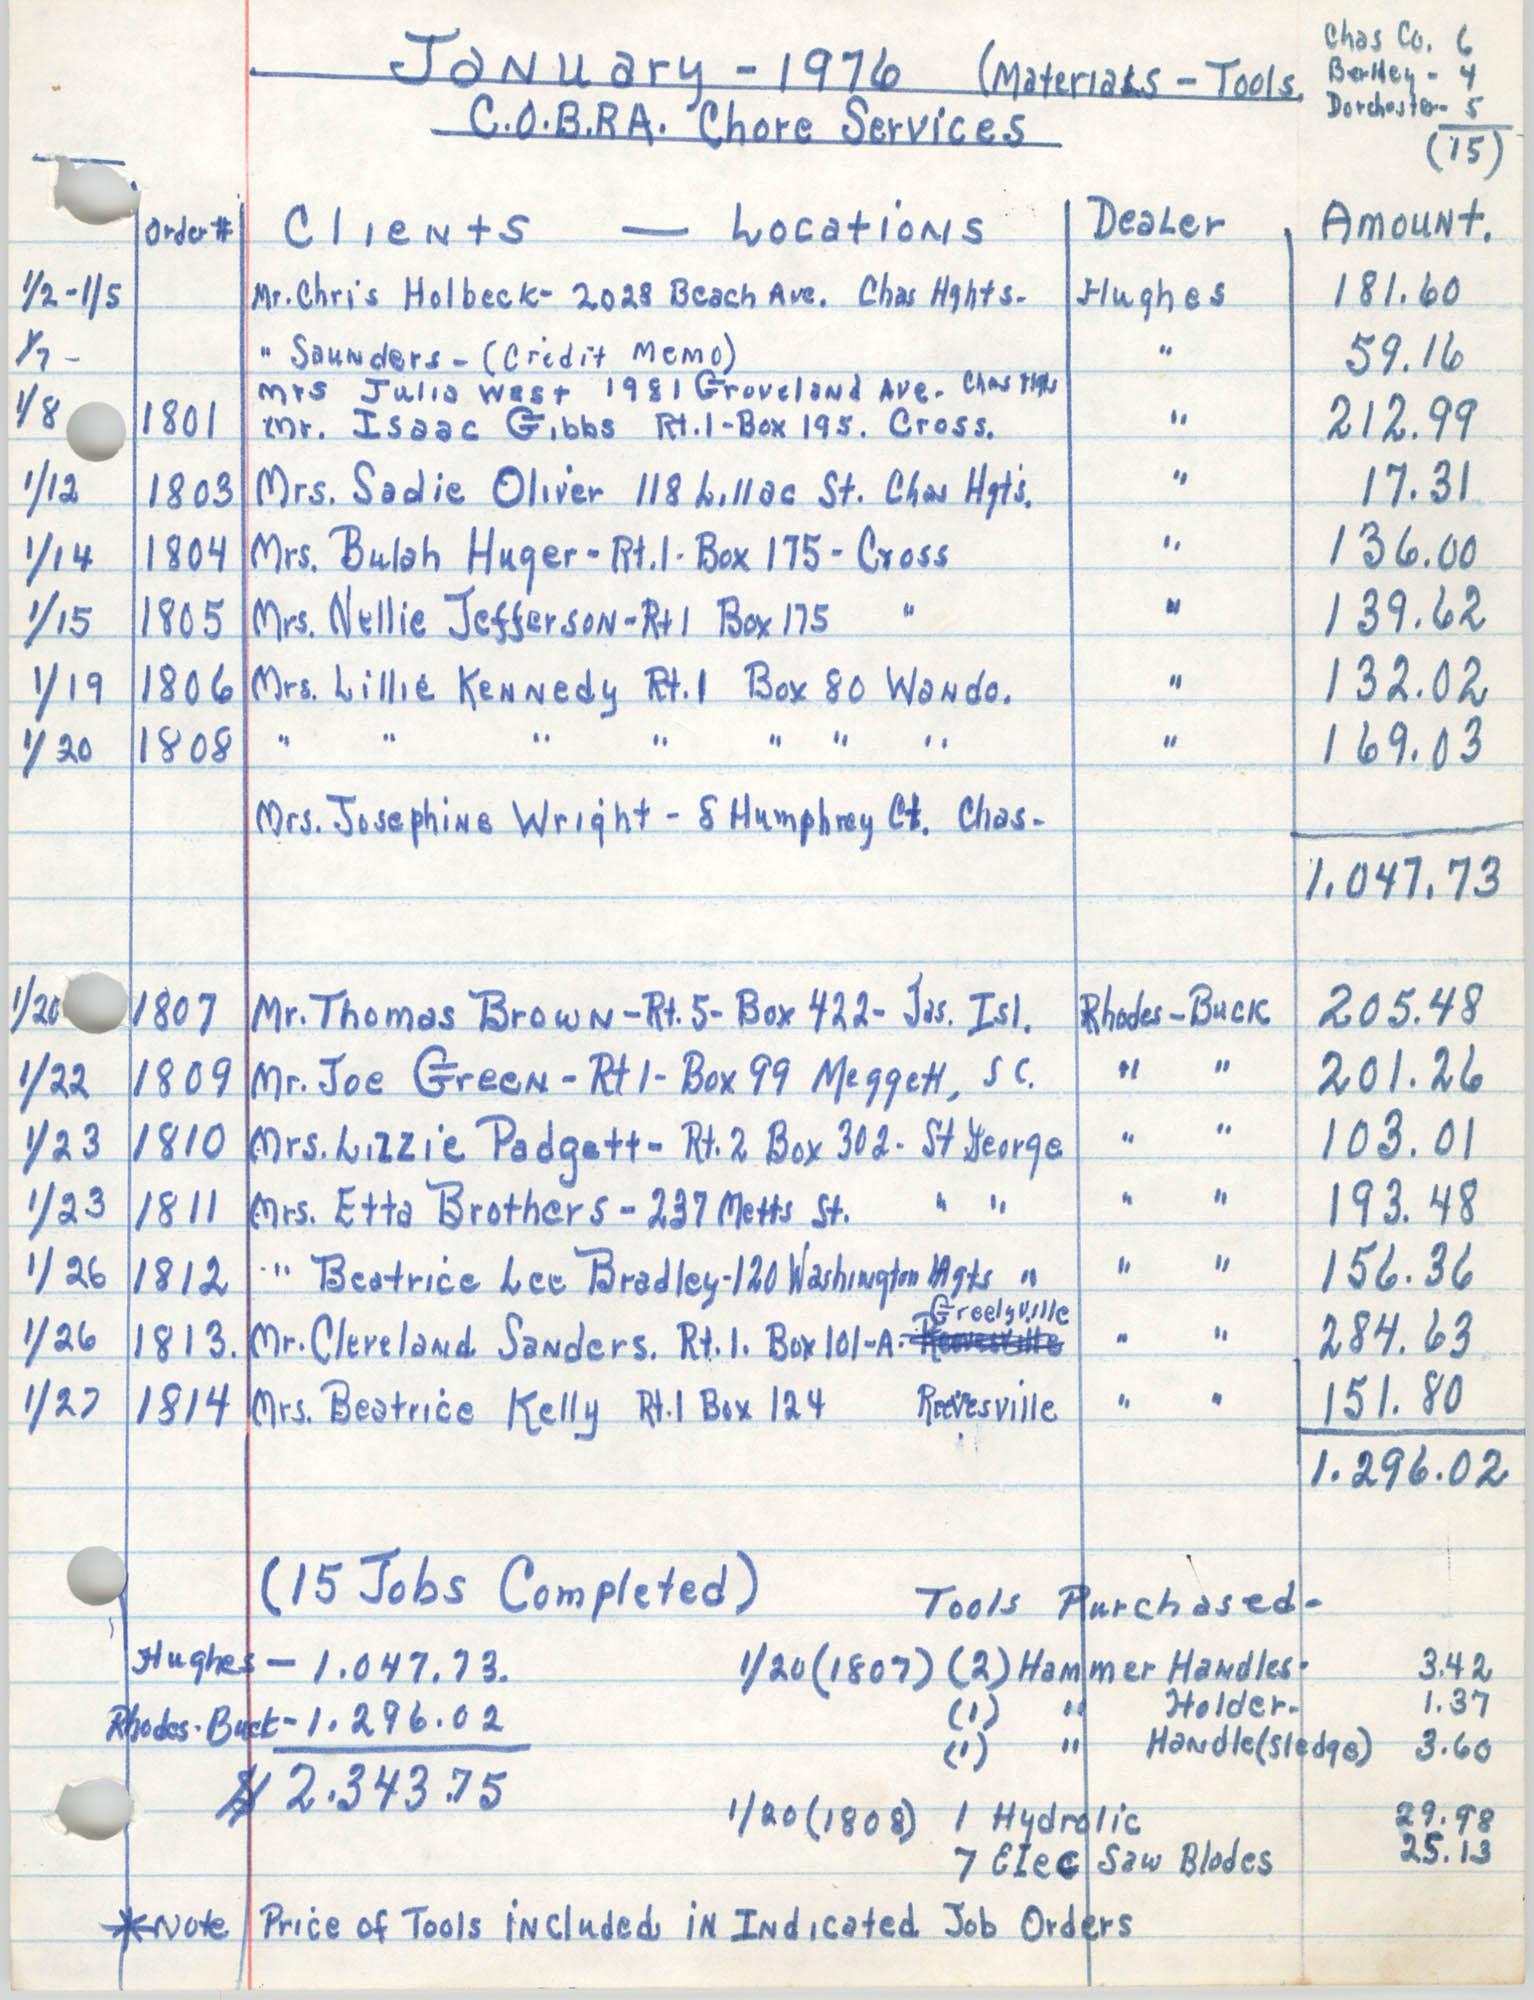 COBRA Chore Services, January 1976, Materials and Tools